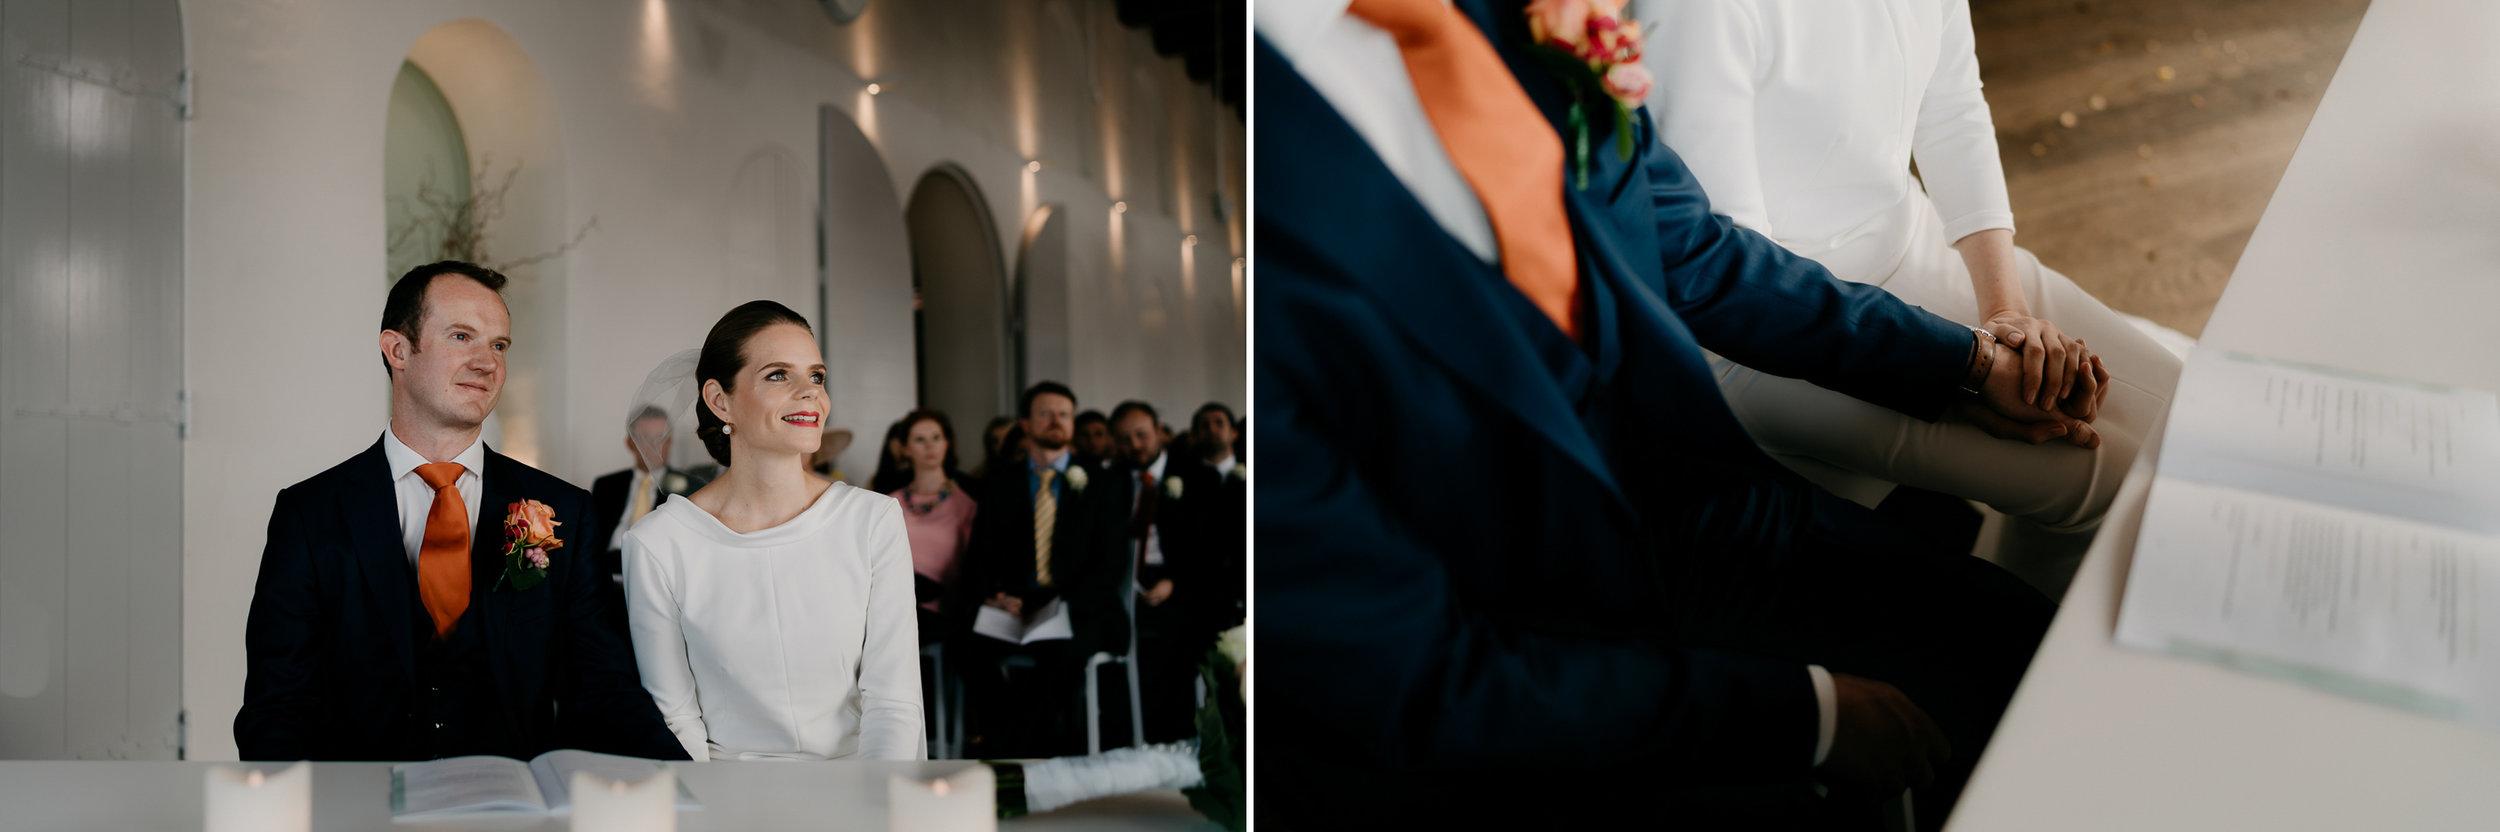 bruidsfotografie-trouwfotograaf-wedding-photographer-amsterdam-James-Jantine-159 copy.jpg